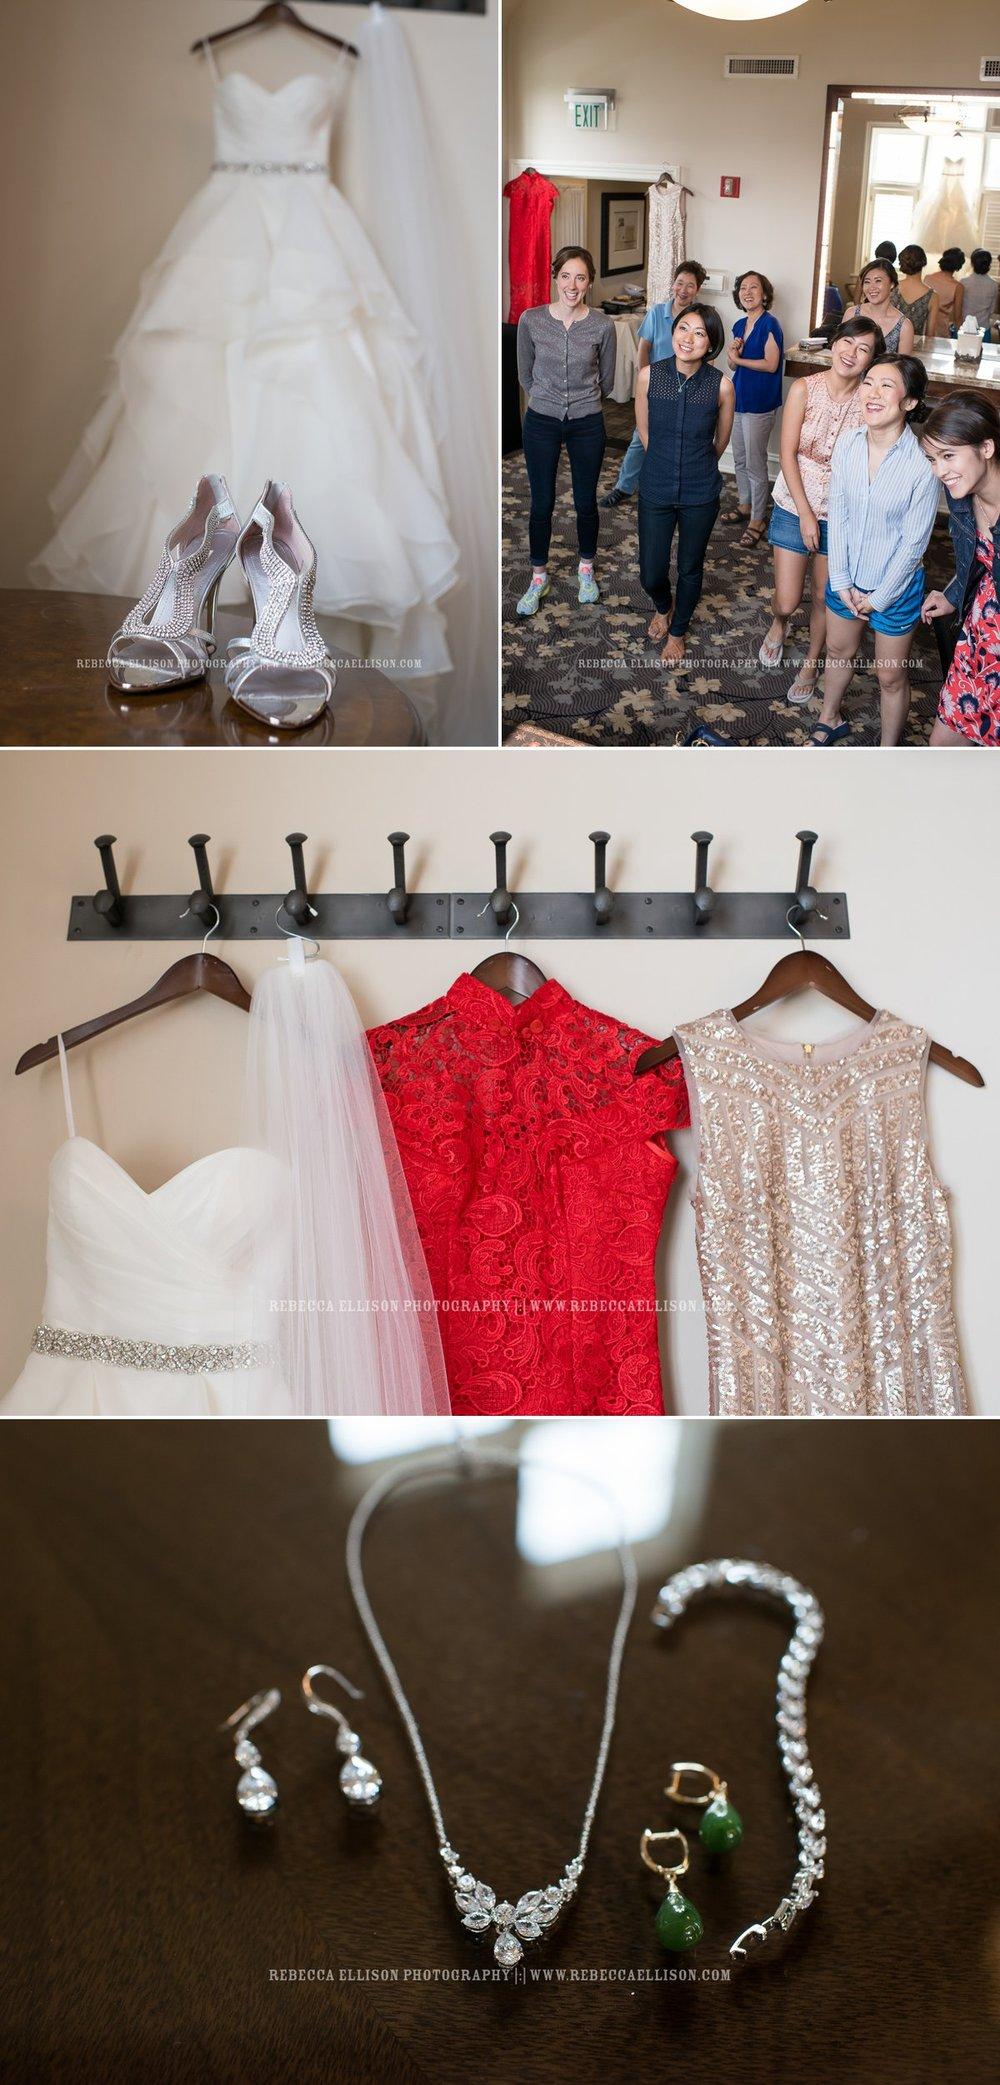 Newcastle Golf Club Wedding | Seattle Wedding Photographer | Rebecca Ellison Photography| www.rebeccaellison.com